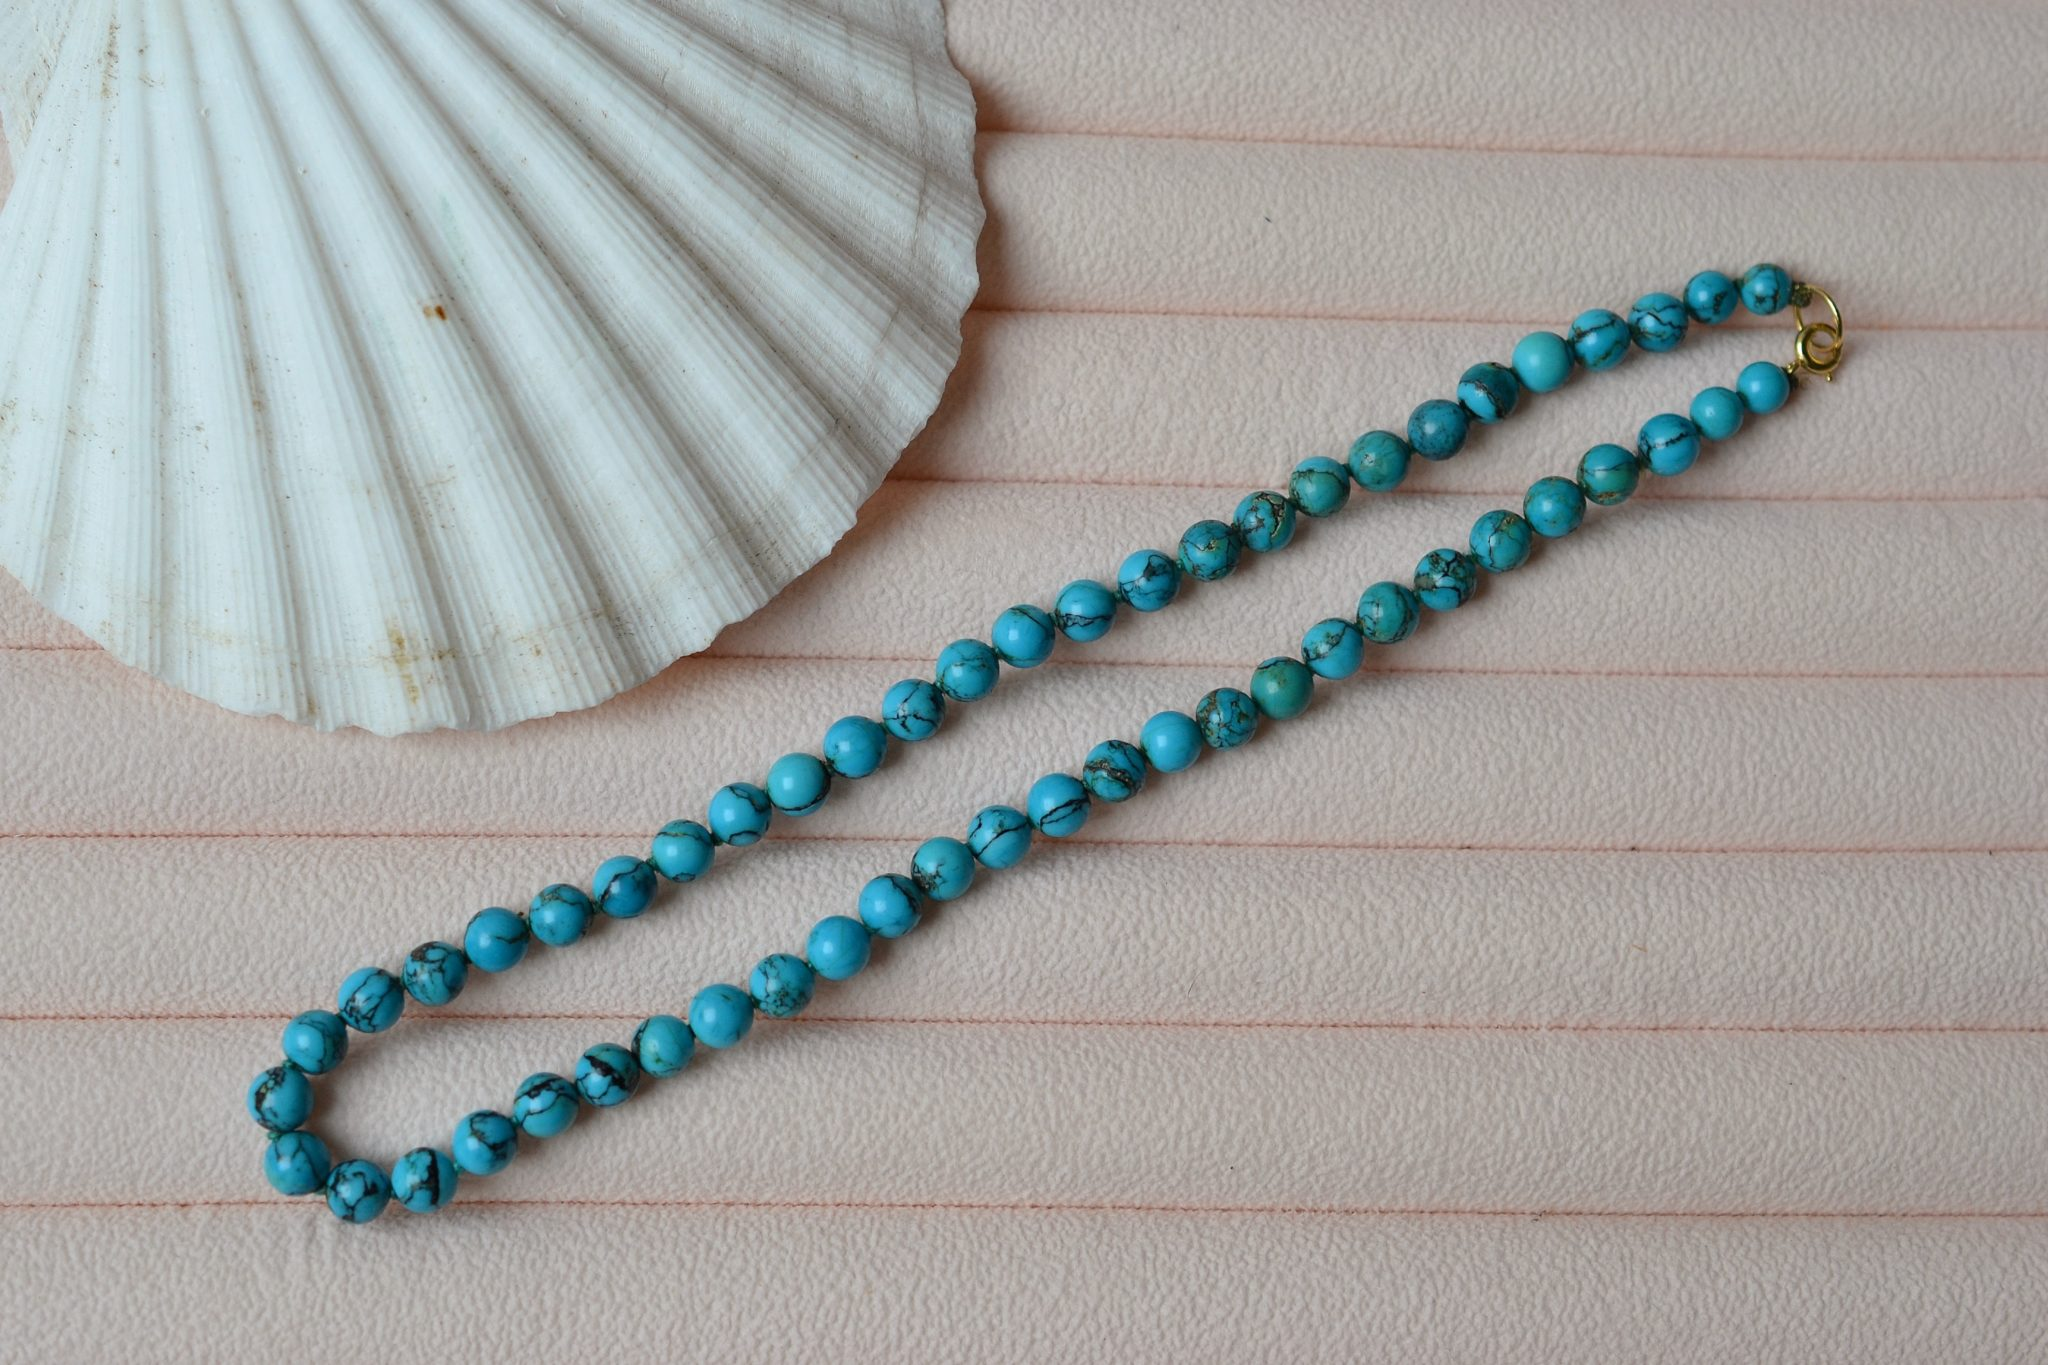 Collier Perles De Turquoise